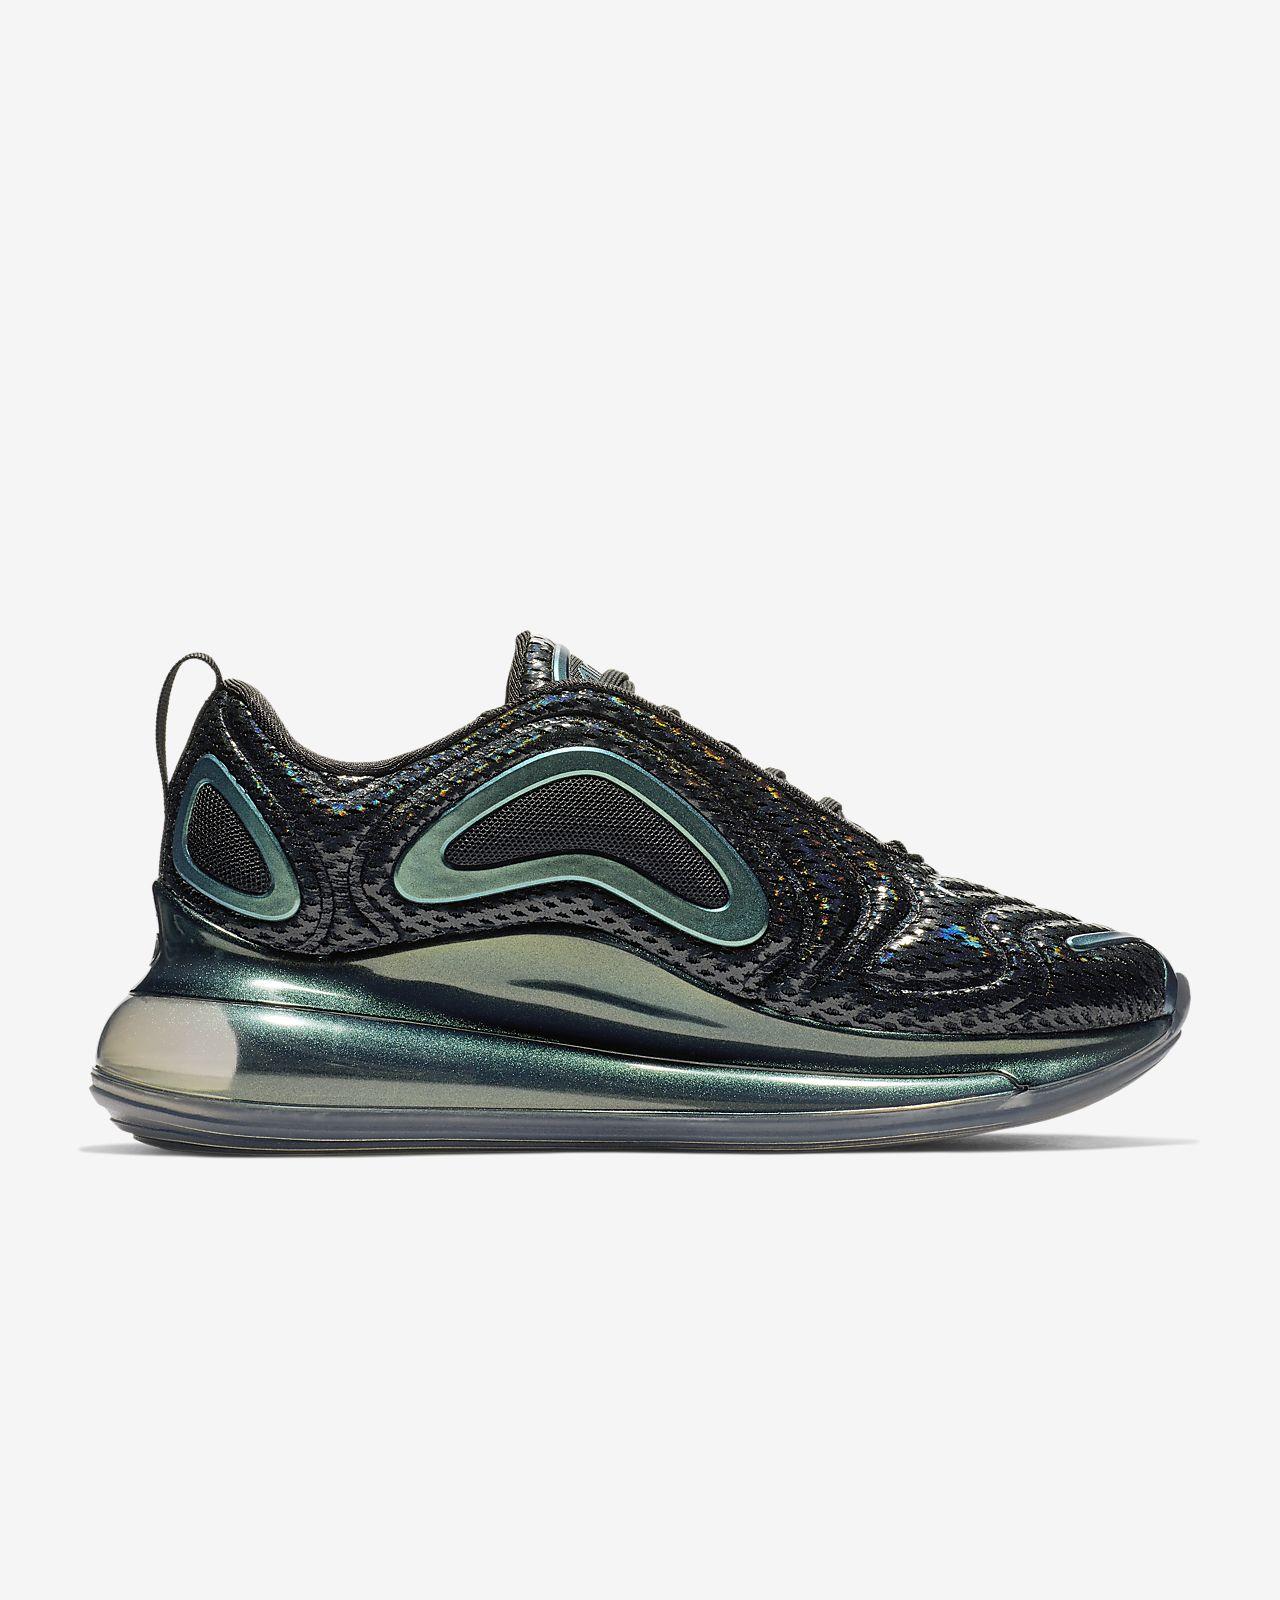 Femme Max Pour Chaussure Air Nike 720 cTFl1KJ